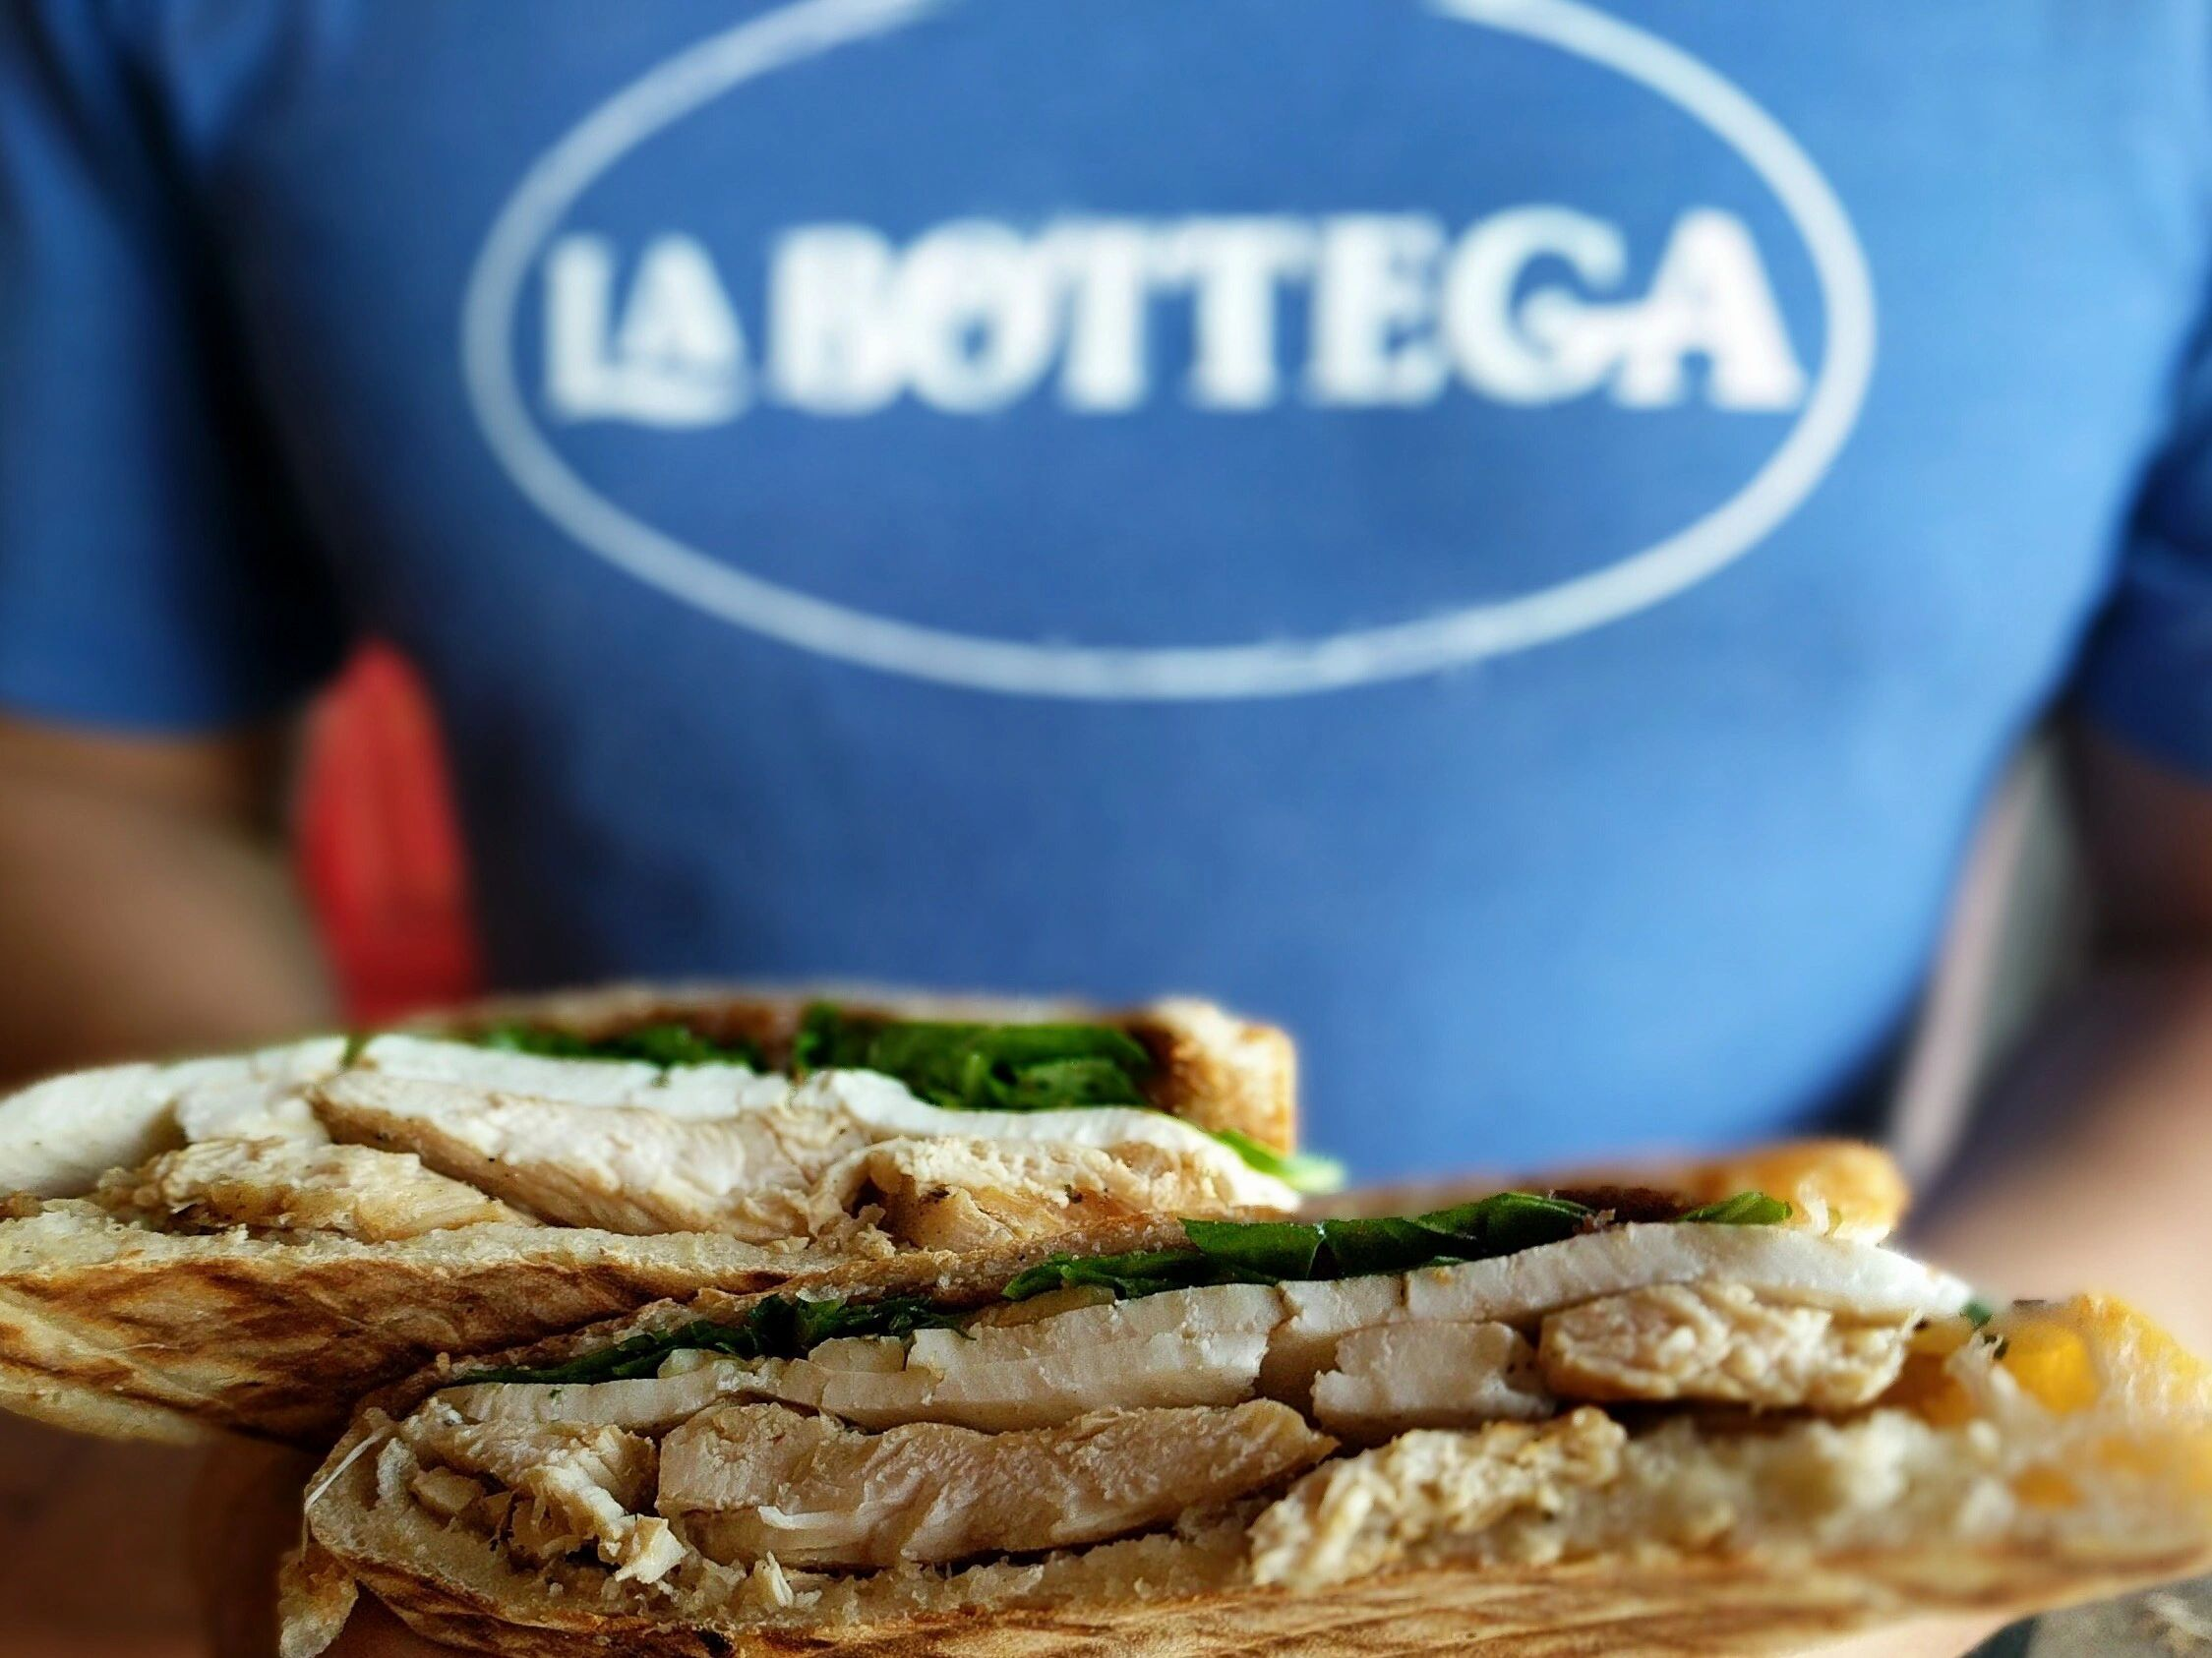 Italian Restaurant - La Bottega Italian Gourmet